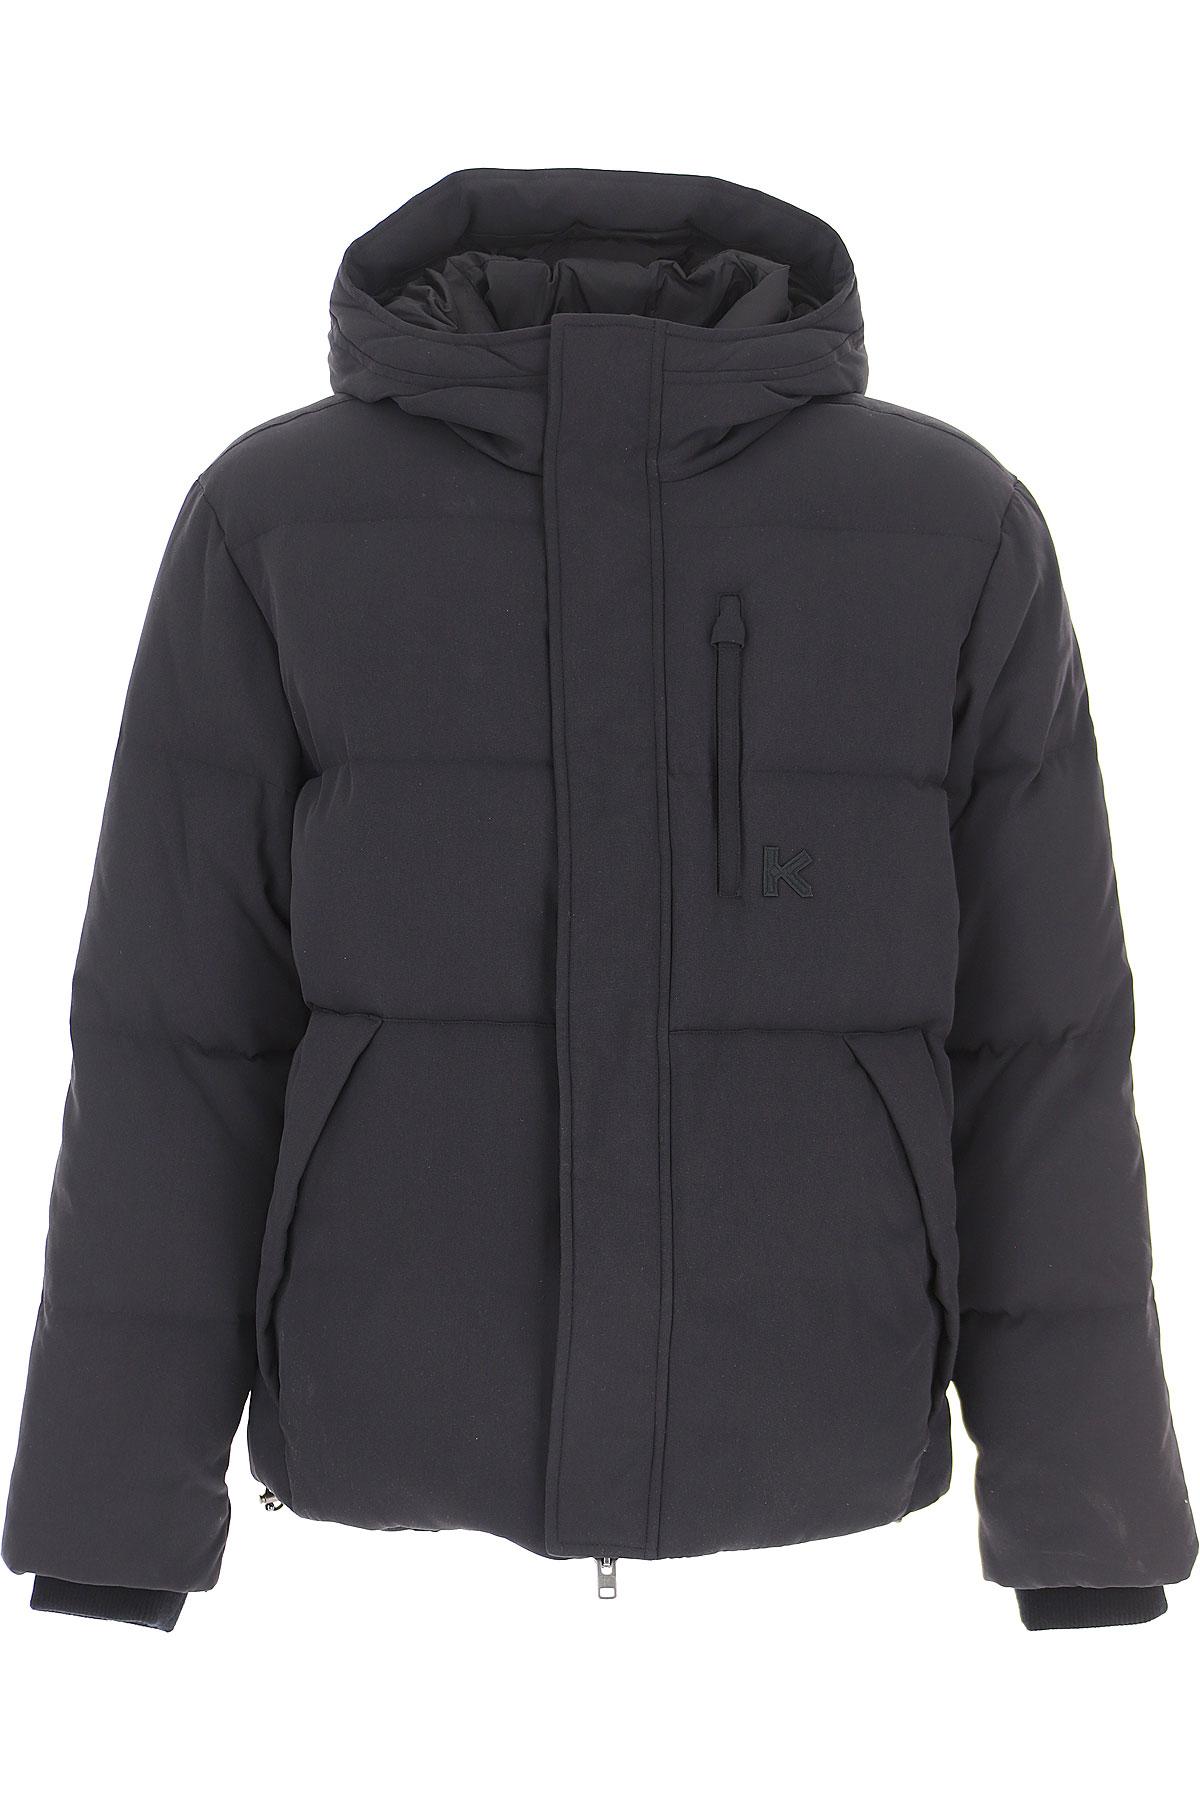 Kenzo Down Jacket for Men, Puffer Ski Jacket On Sale, Black, Nylon, 2019, L S